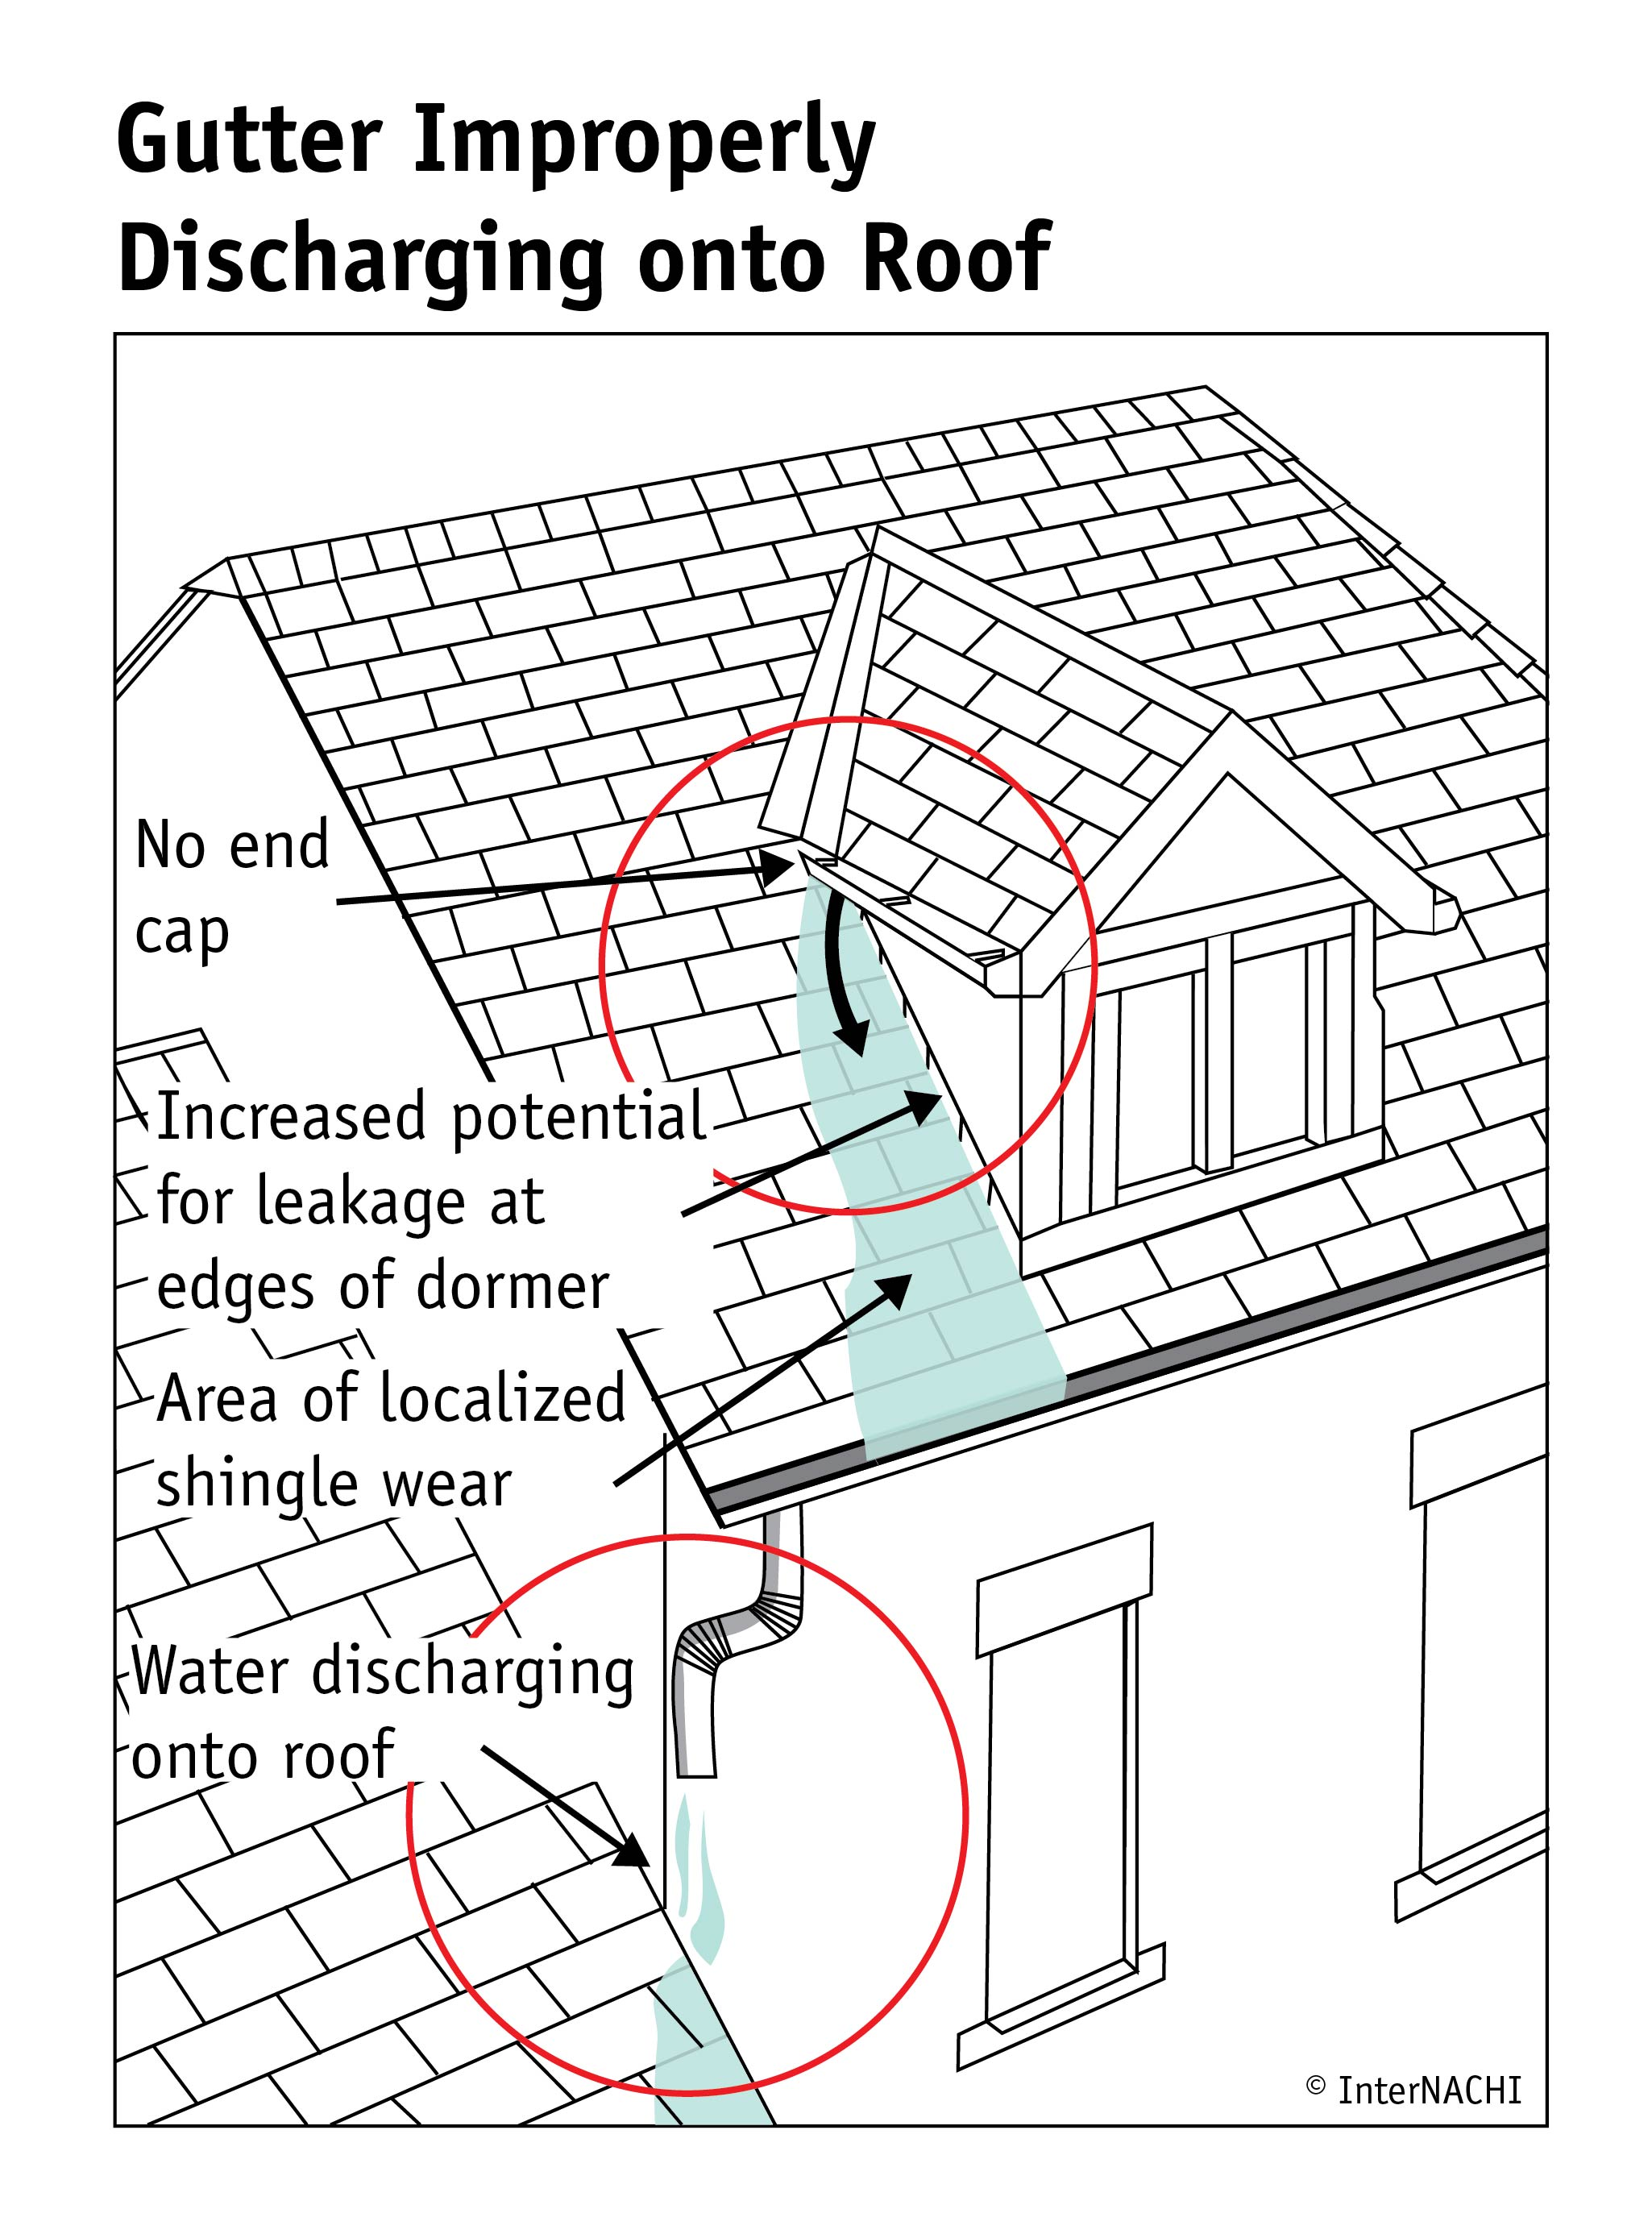 Gutter Improperly Discharging Onto Roof Inspection